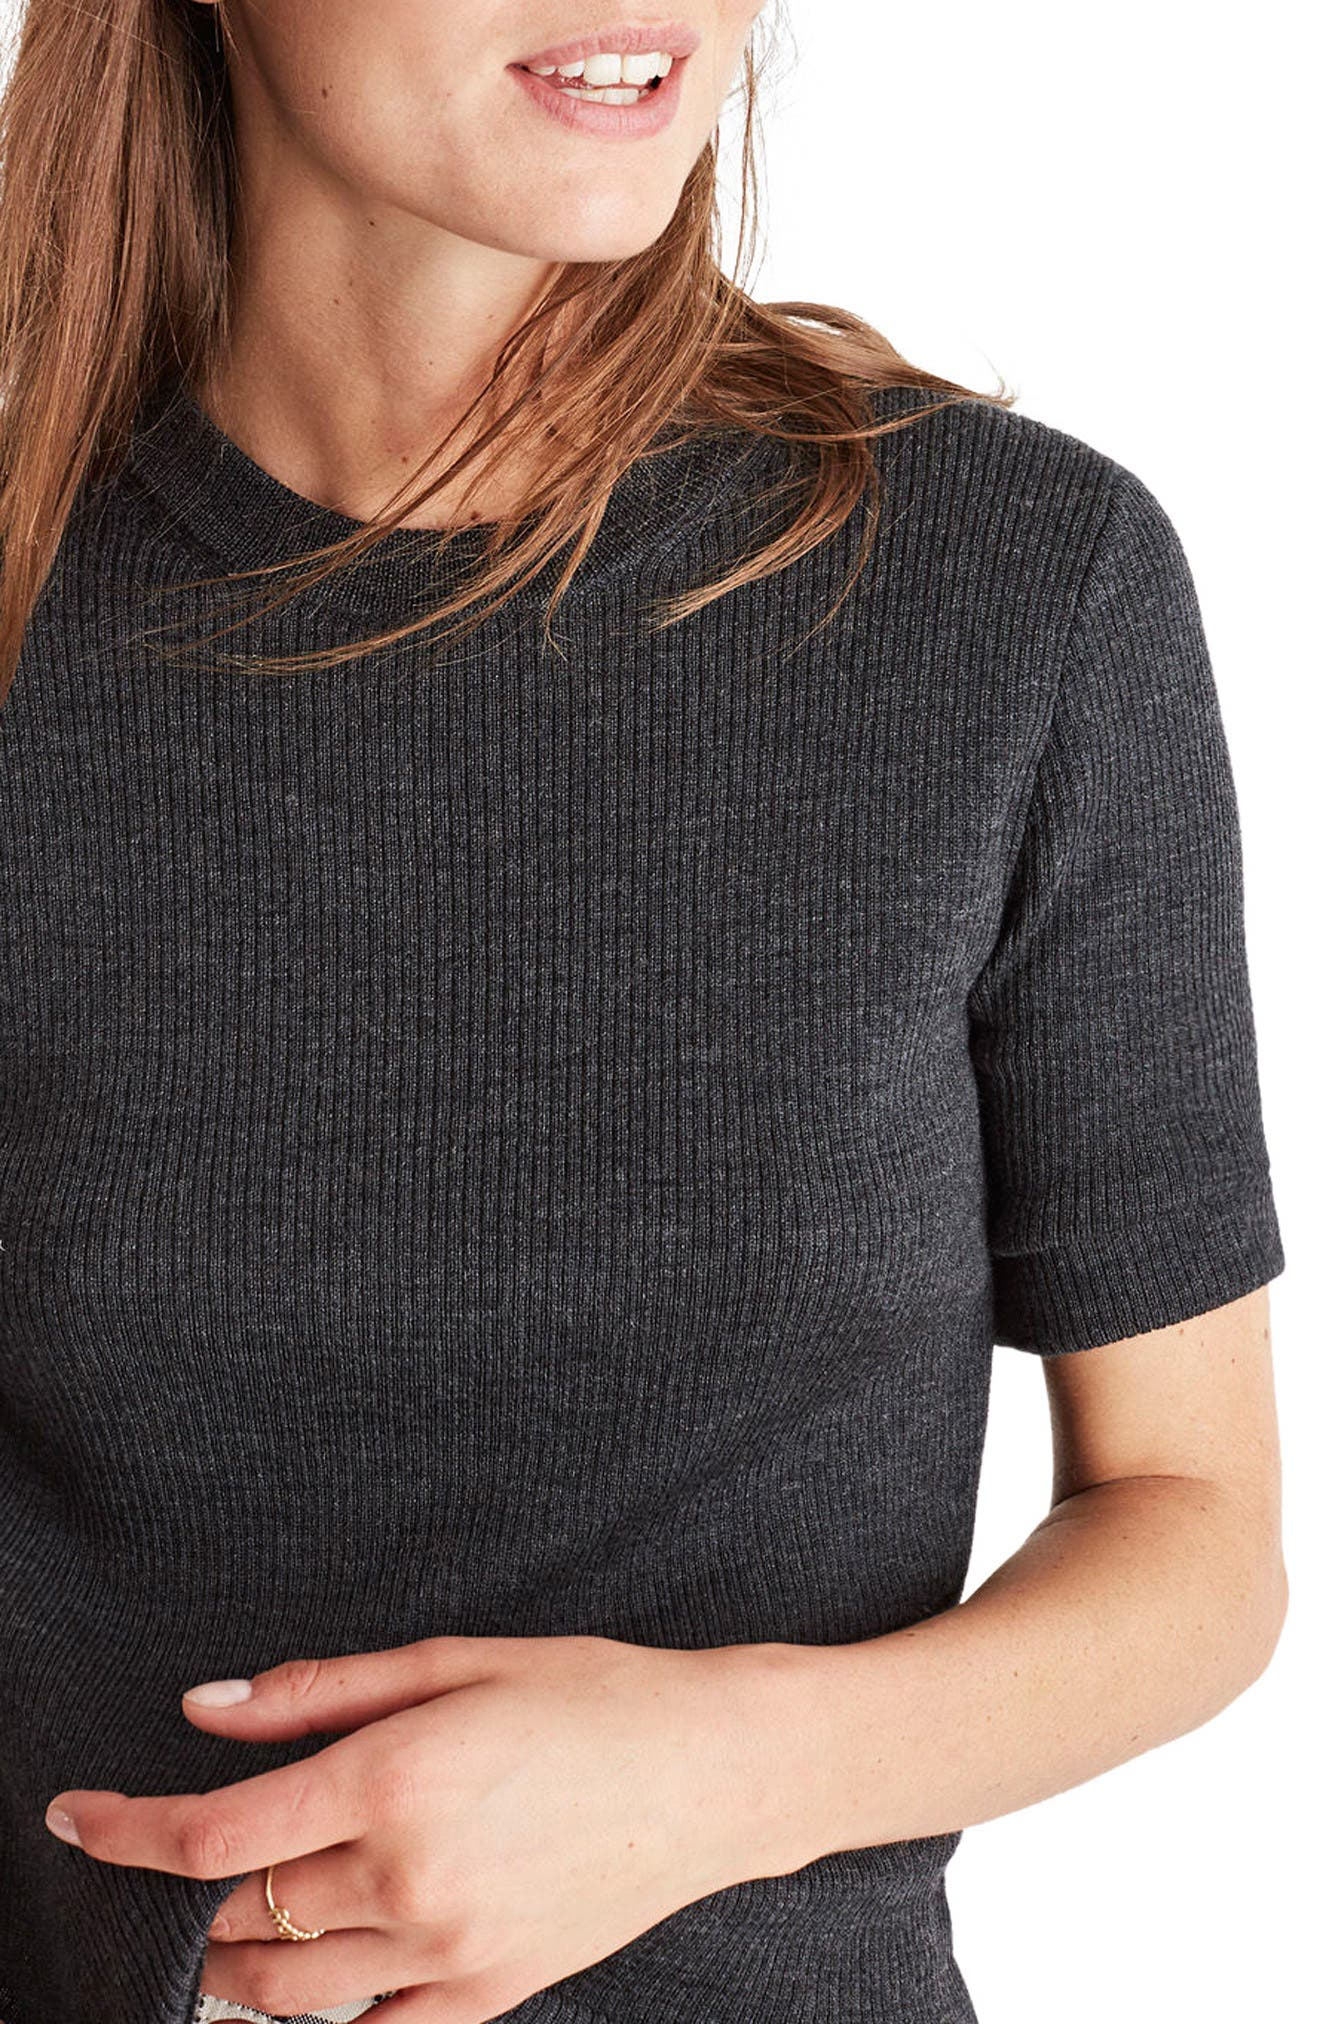 Madewell 'Slim Jim' Rib Knit Merino Wool Sweater